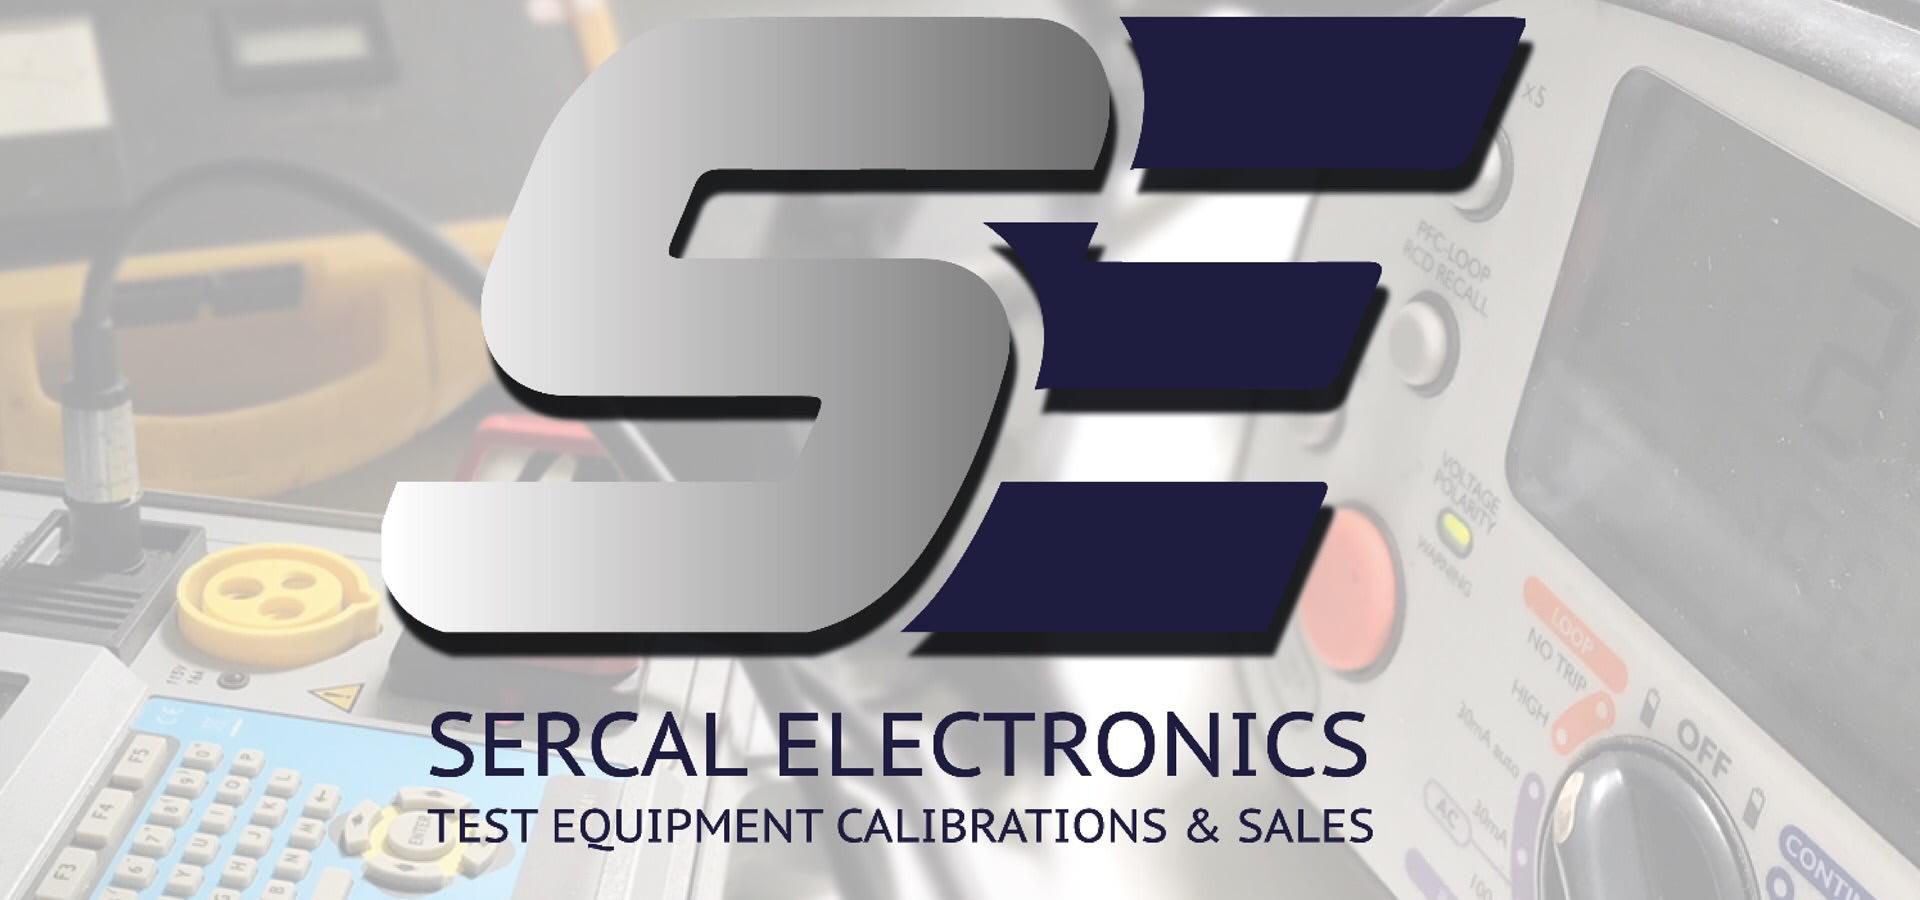 Sercal Electronics